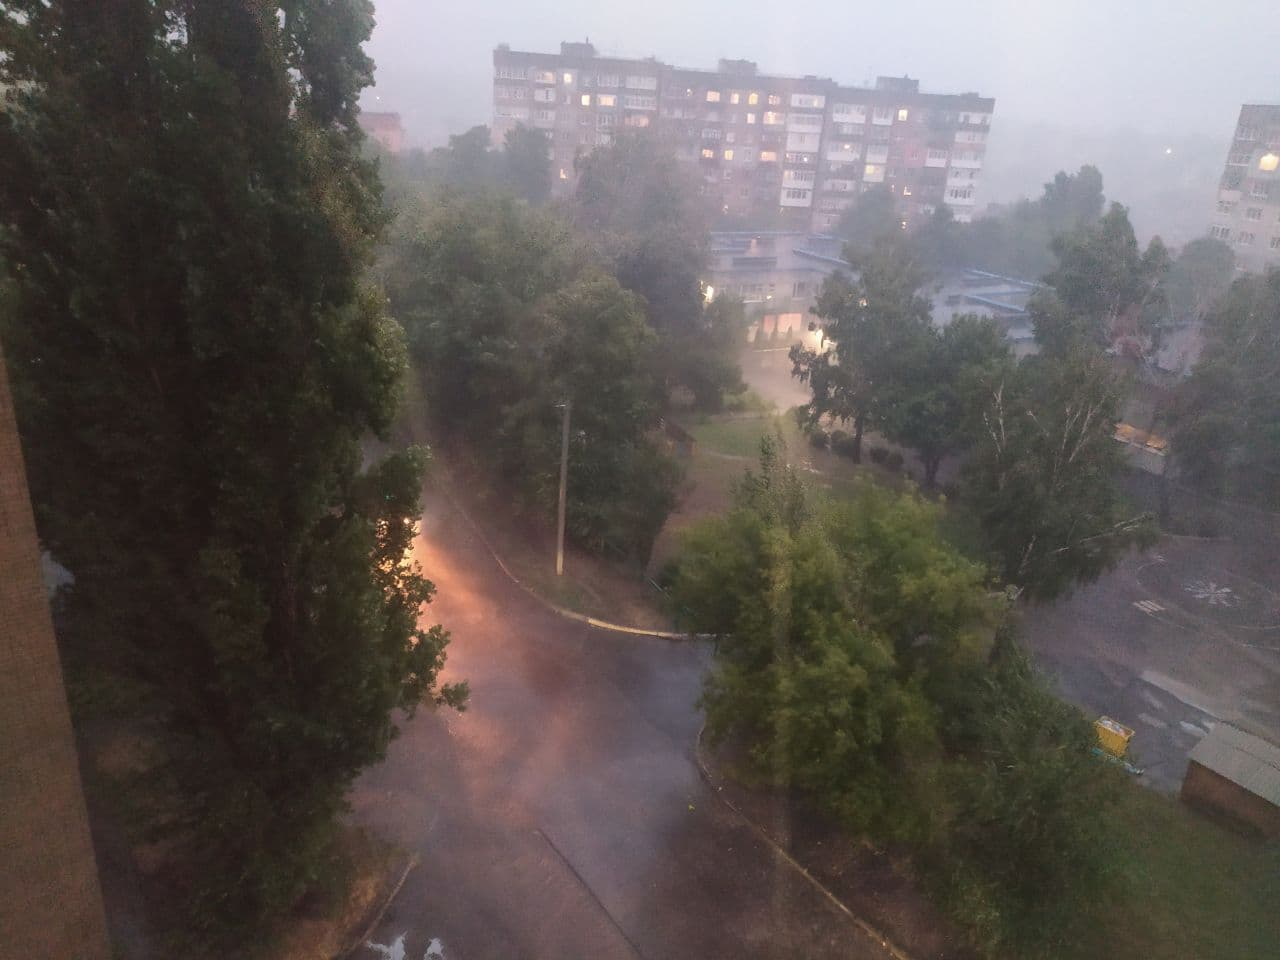 Негода наробила лиха у Кропивницькому (ФОТО, ВІДЕО)